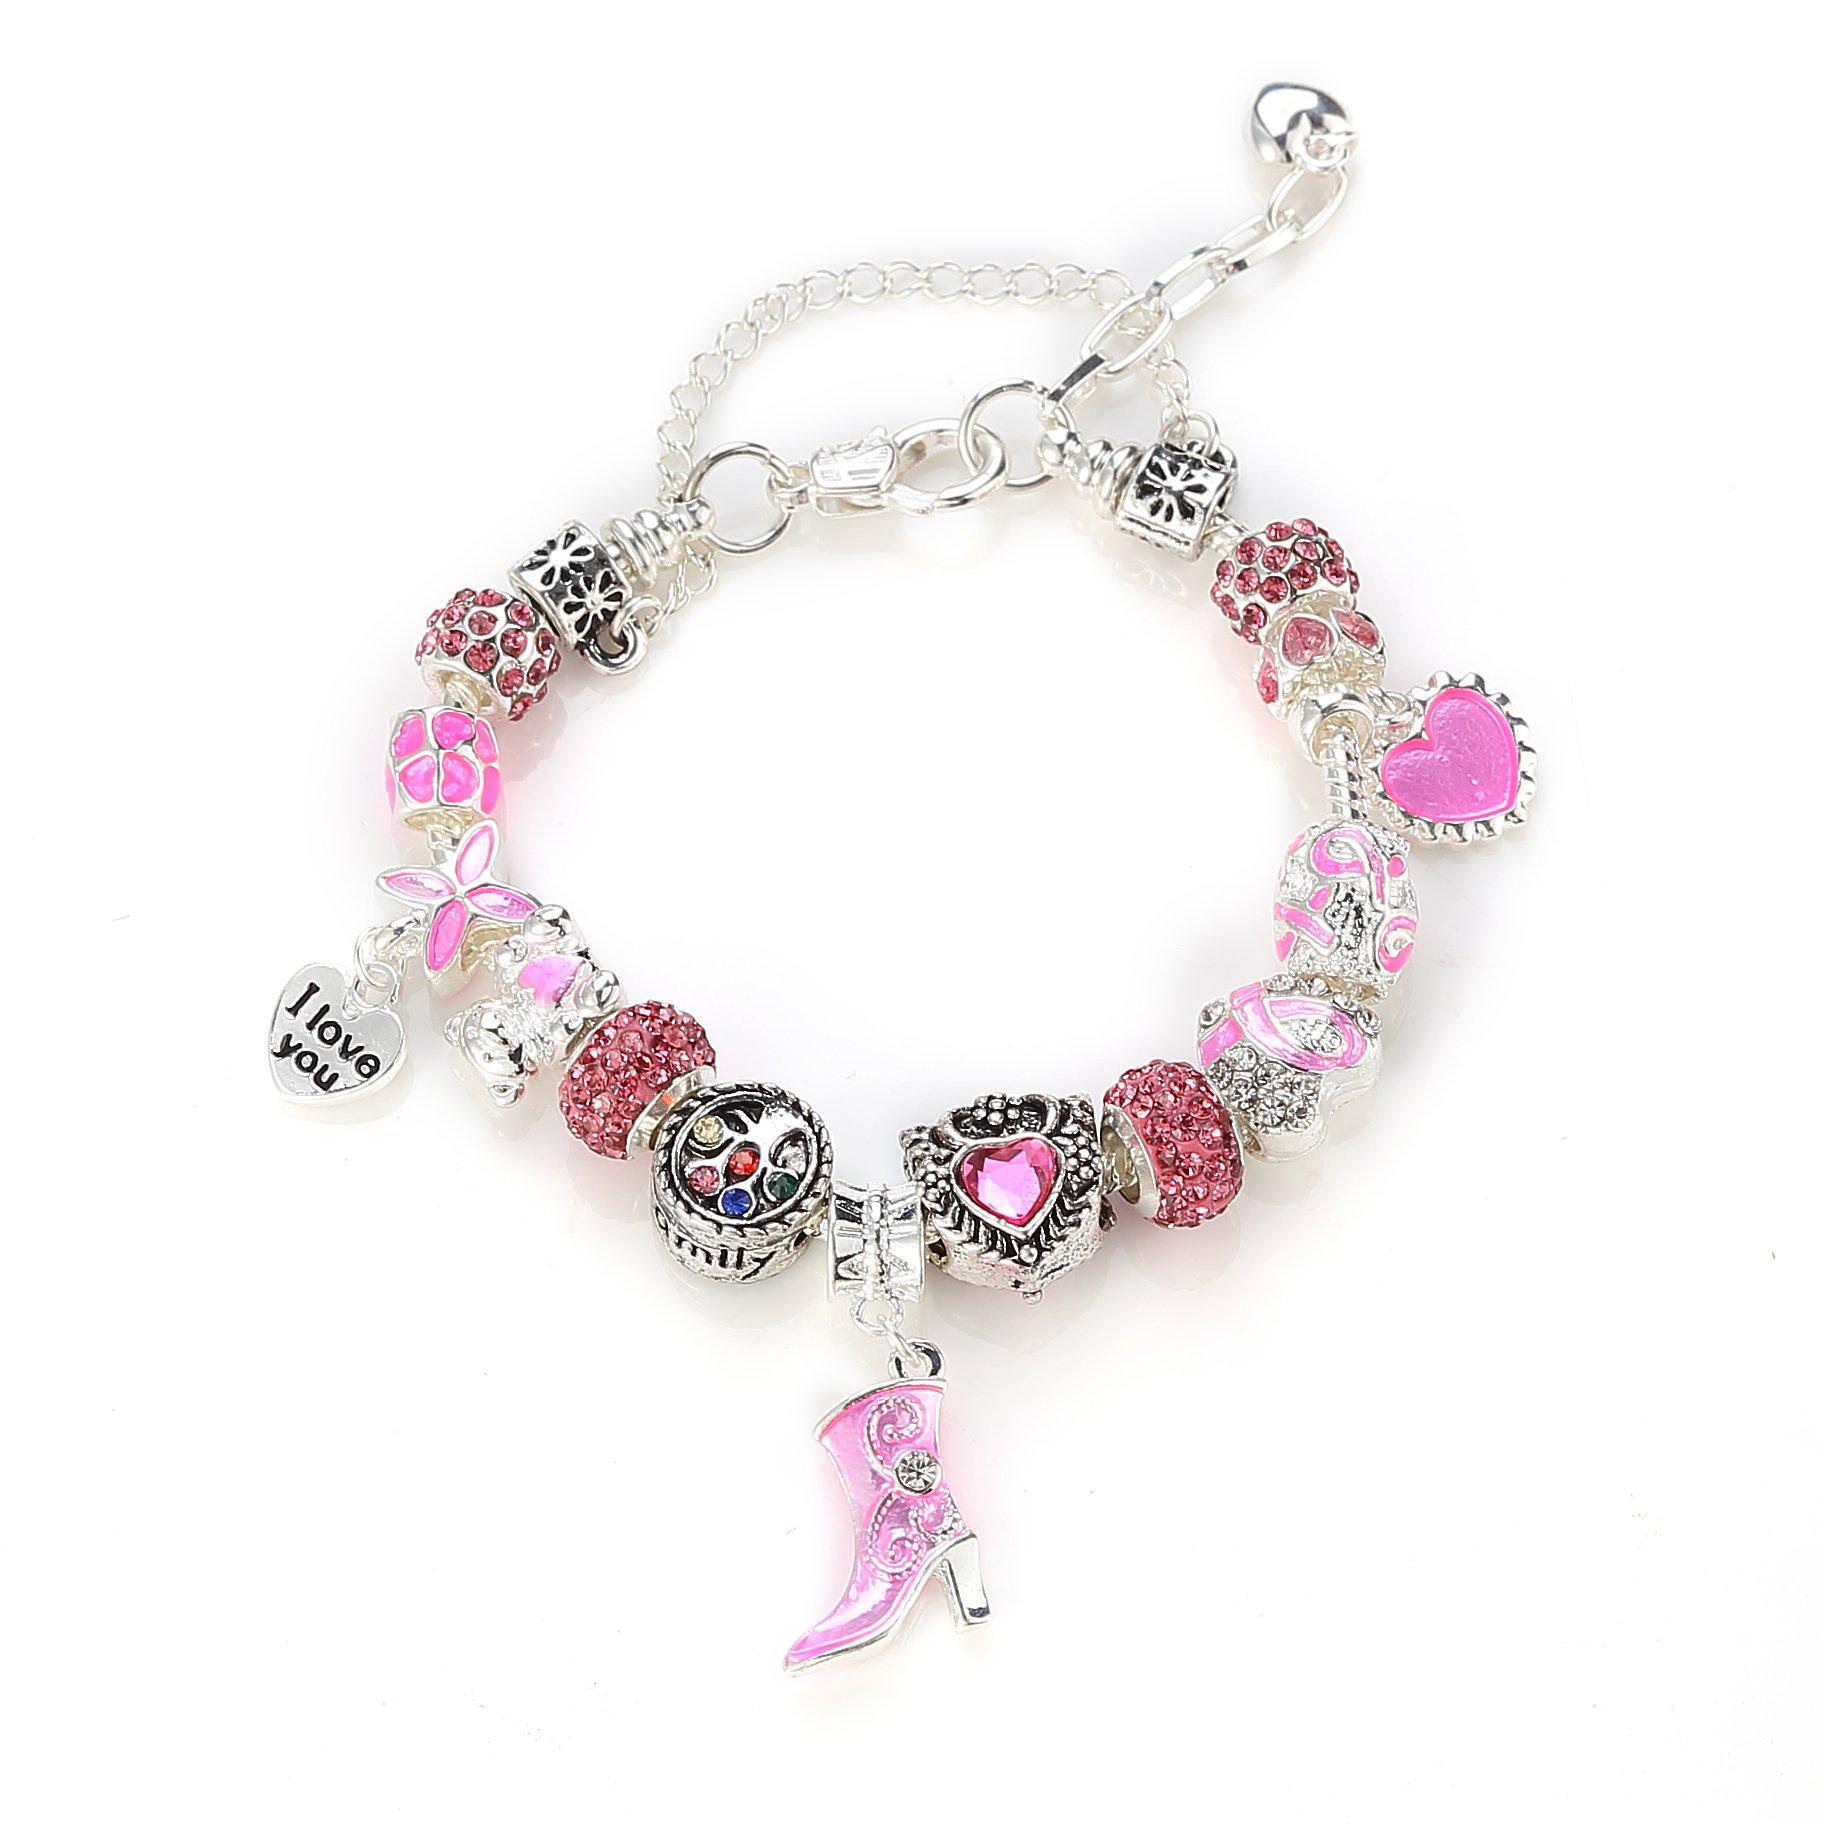 NOVADAB Pink Ribbon Breast Cancer Awareness Charms Bracelet, Silver Tone 'I  Love You' Bead Bracelet